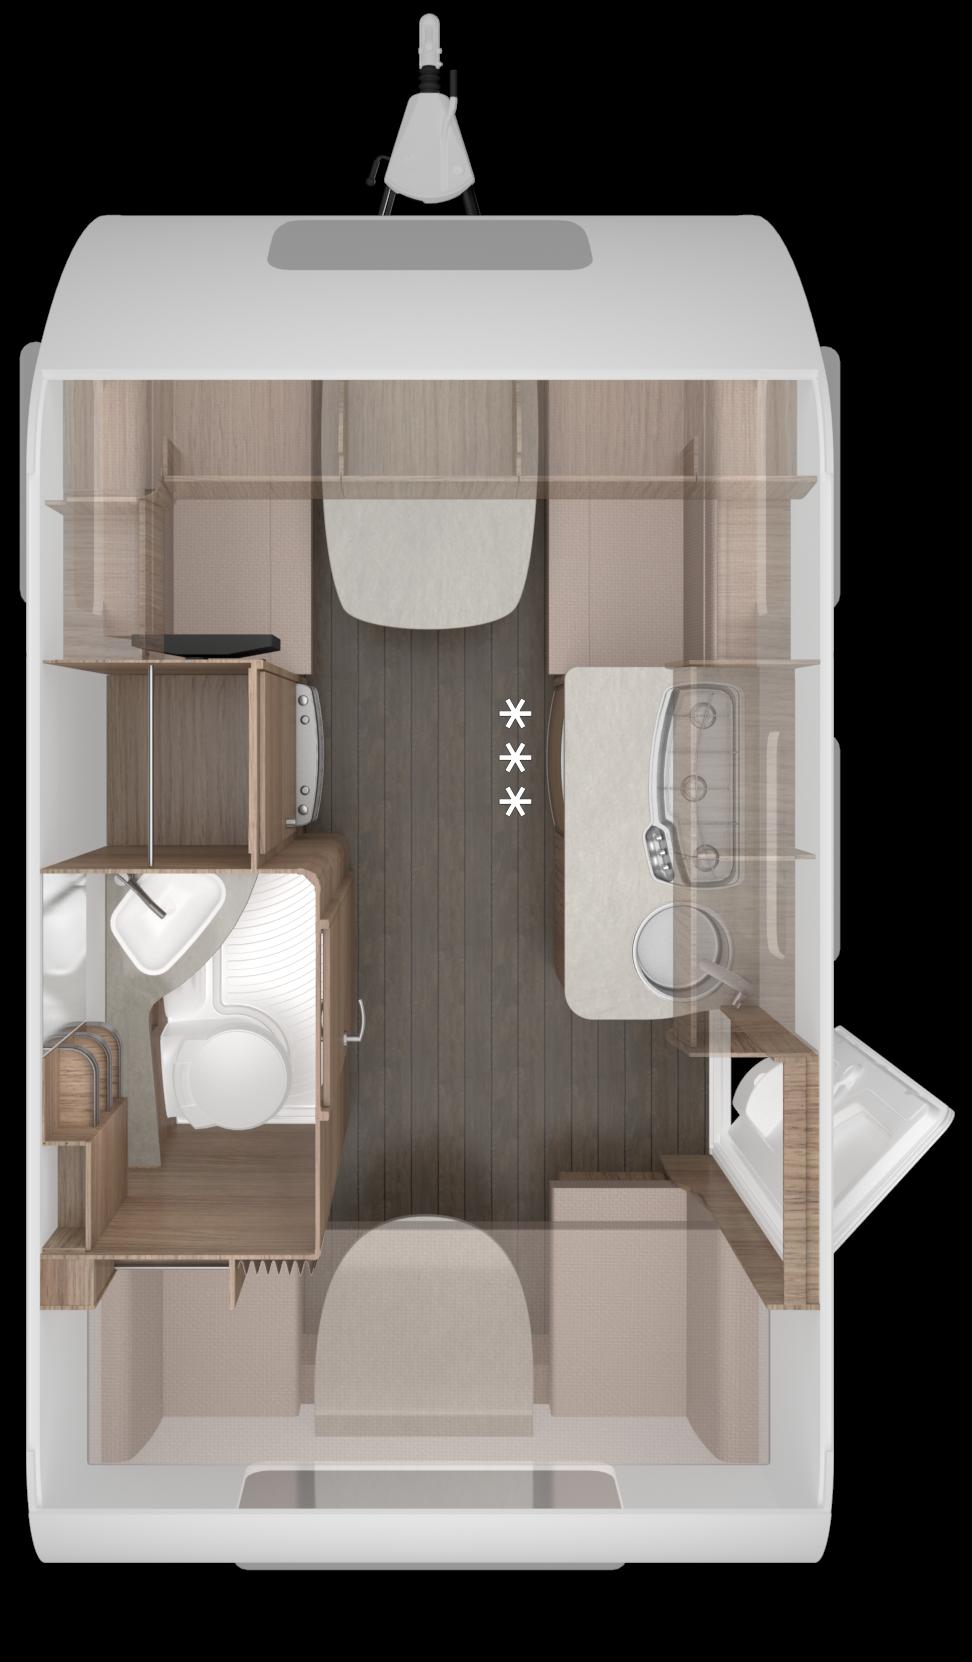 Cool Knaus Sport Silver Selection Caravan Centrum Meerkerk Unemploymentrelief Wooden Chair Designs For Living Room Unemploymentrelieforg